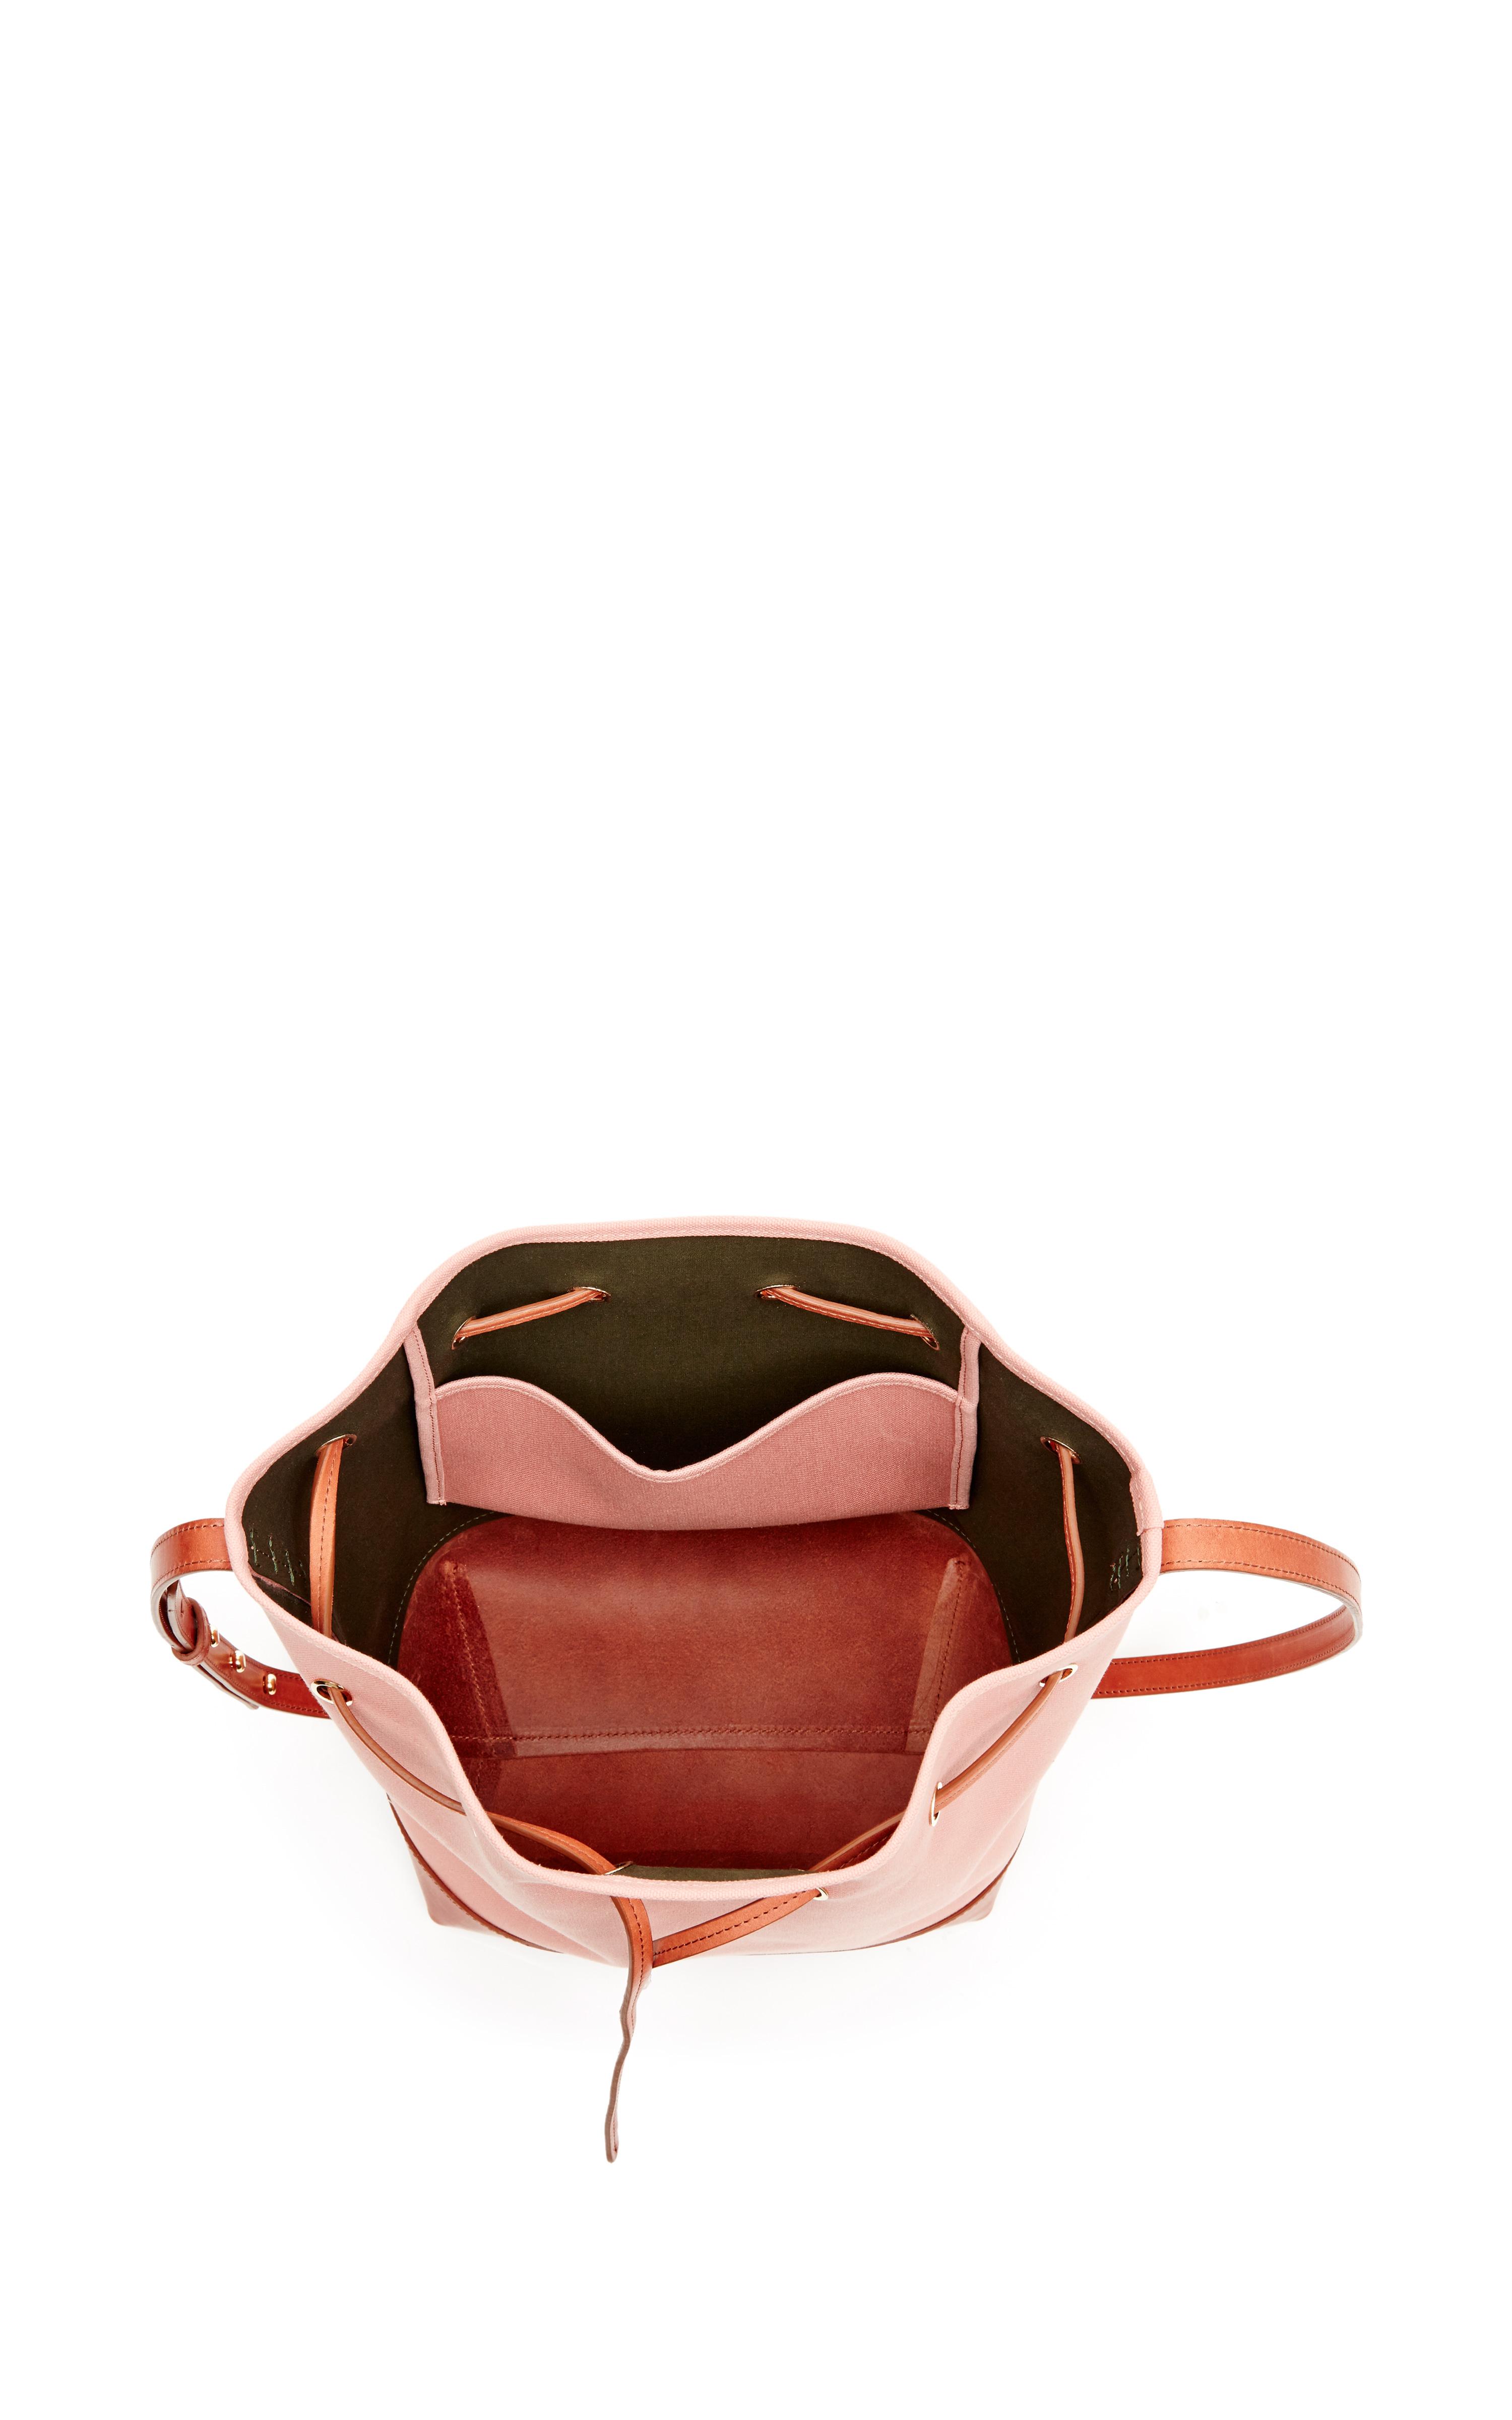 865b386a6 Gallery. Previously sold at: Moda Operandi · Women's Mansur Gavriel Bucket  Bag